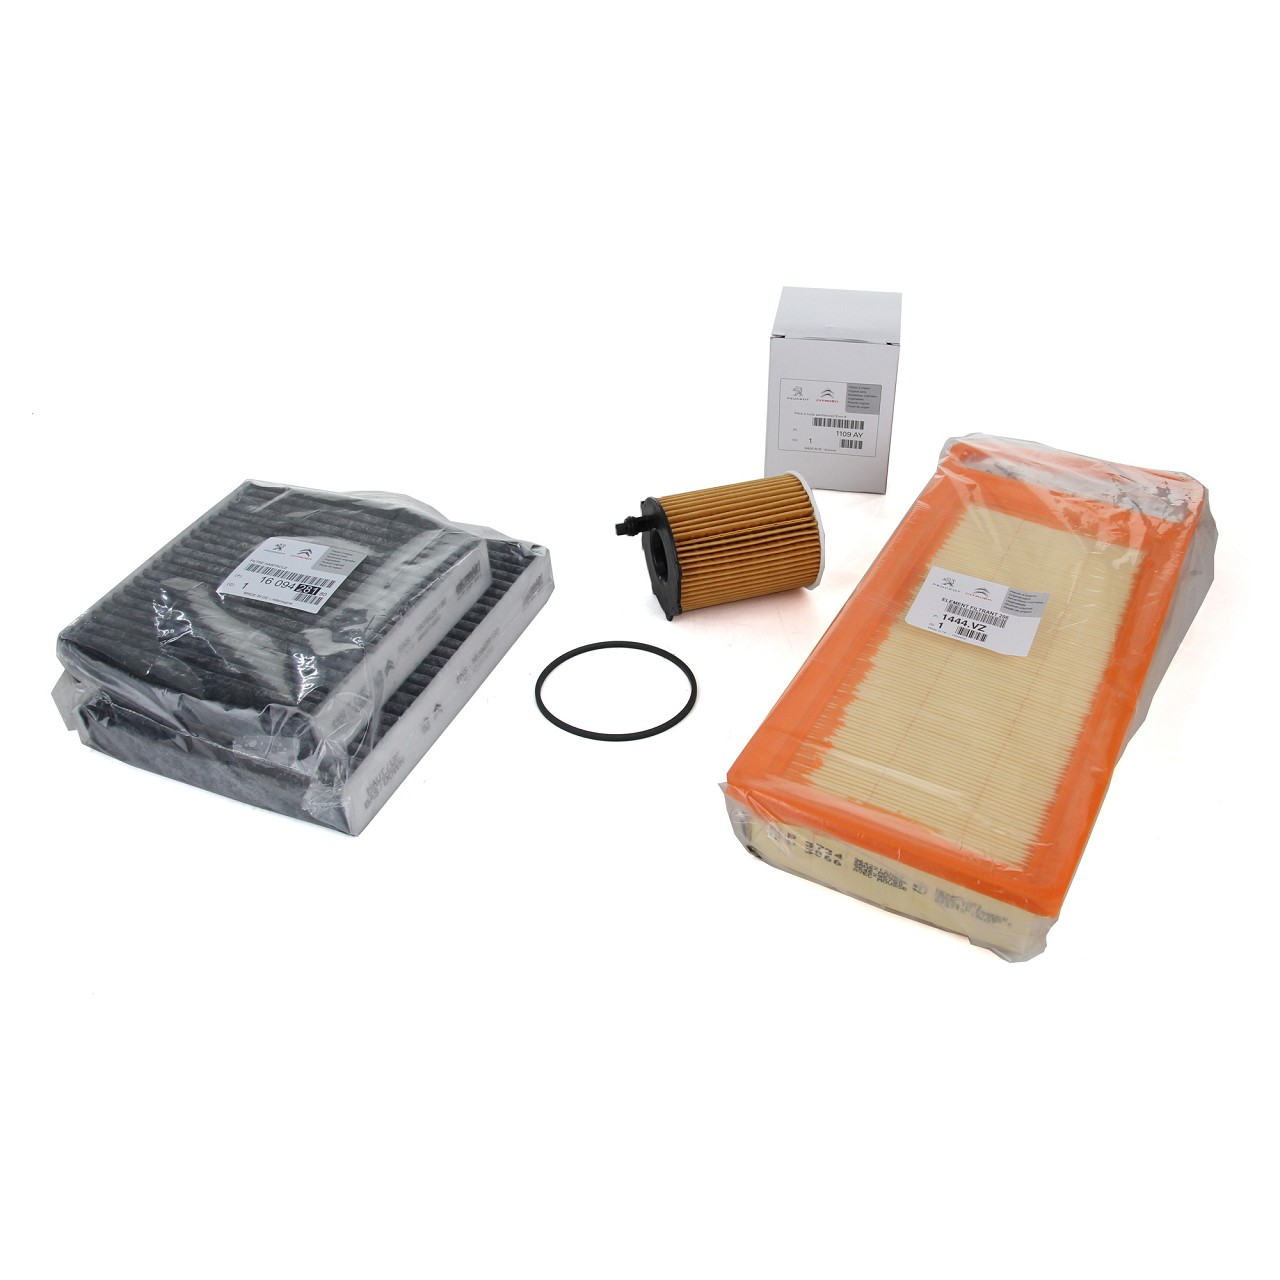 ORIGINAL Citroen Peugeot Inspektionskit Filterpaket C3 II 207 1.4 HDi 68 PS